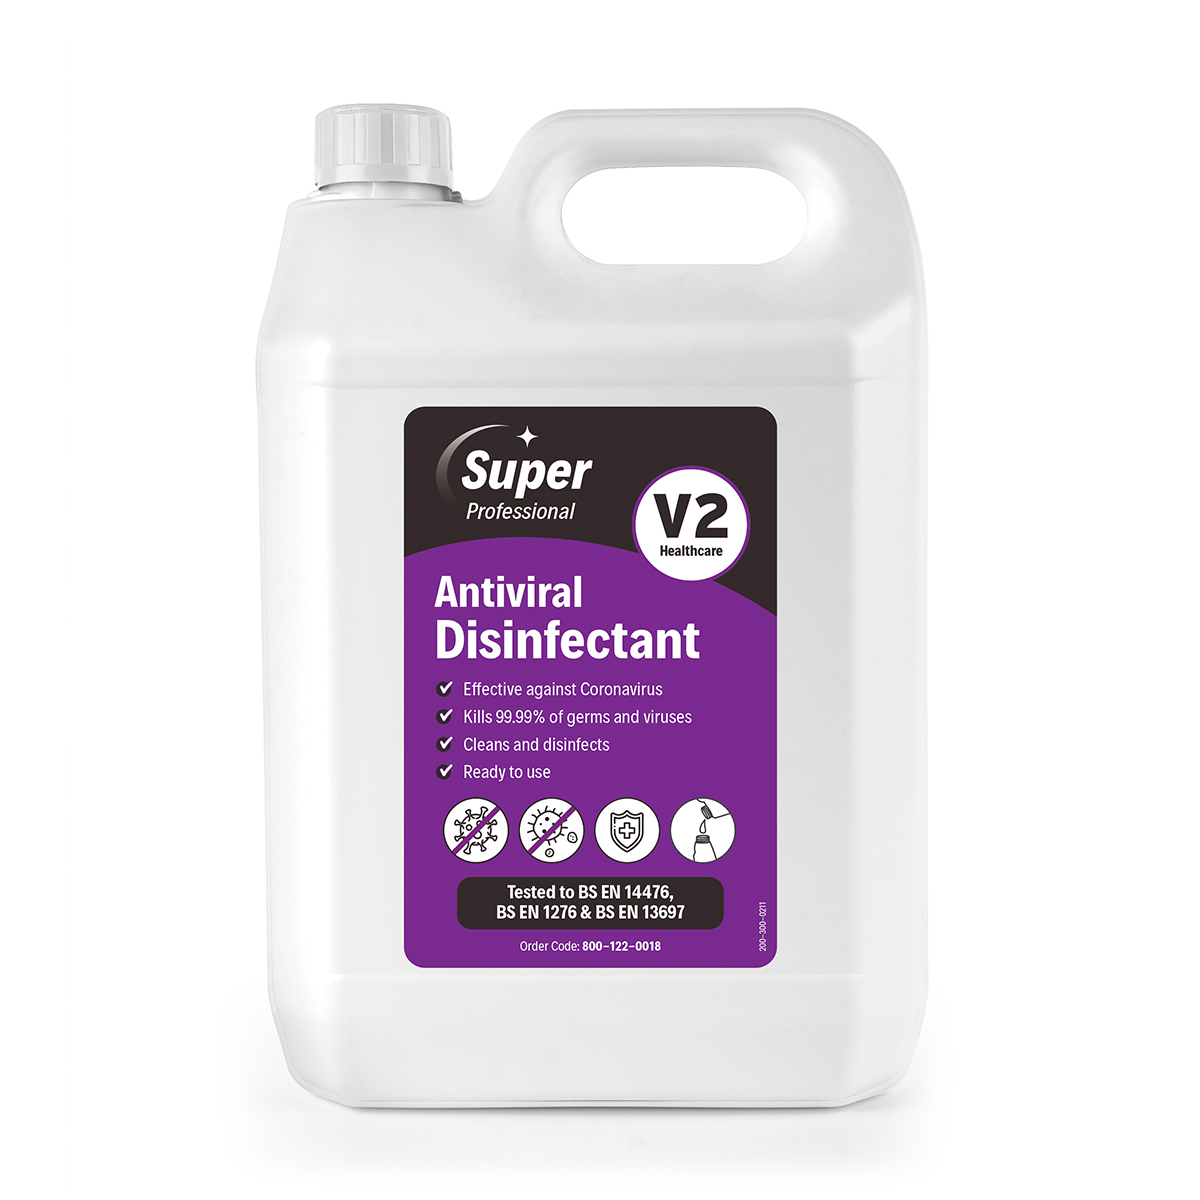 V2 Antiviral Disinfectant 5L